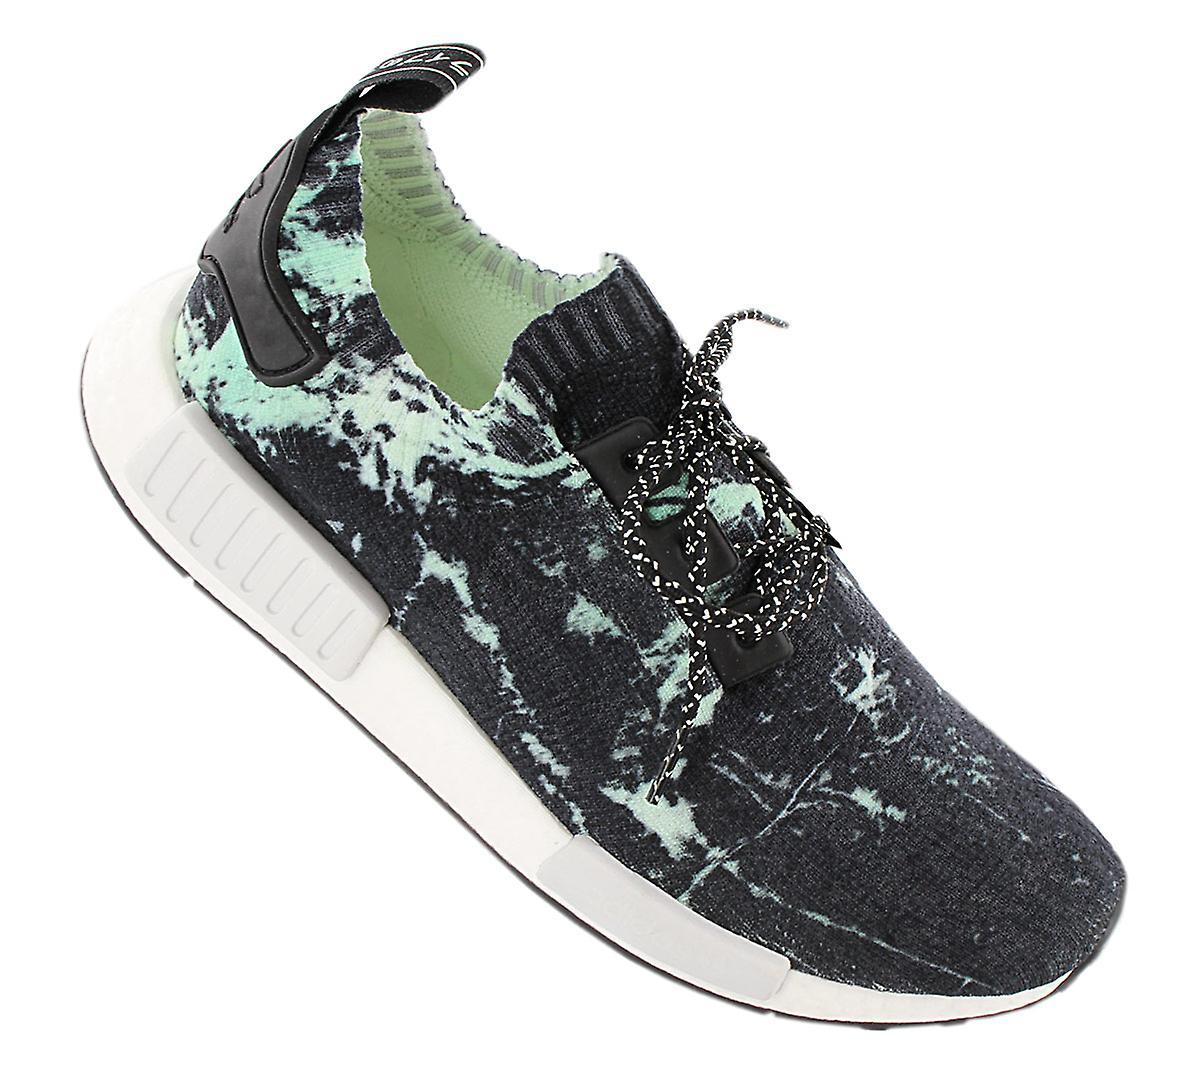 Adidas Originals Nmd R1 Pk Boost - Primeknit Herresko Flerfarget Bb7996 Joggesko Sportssko